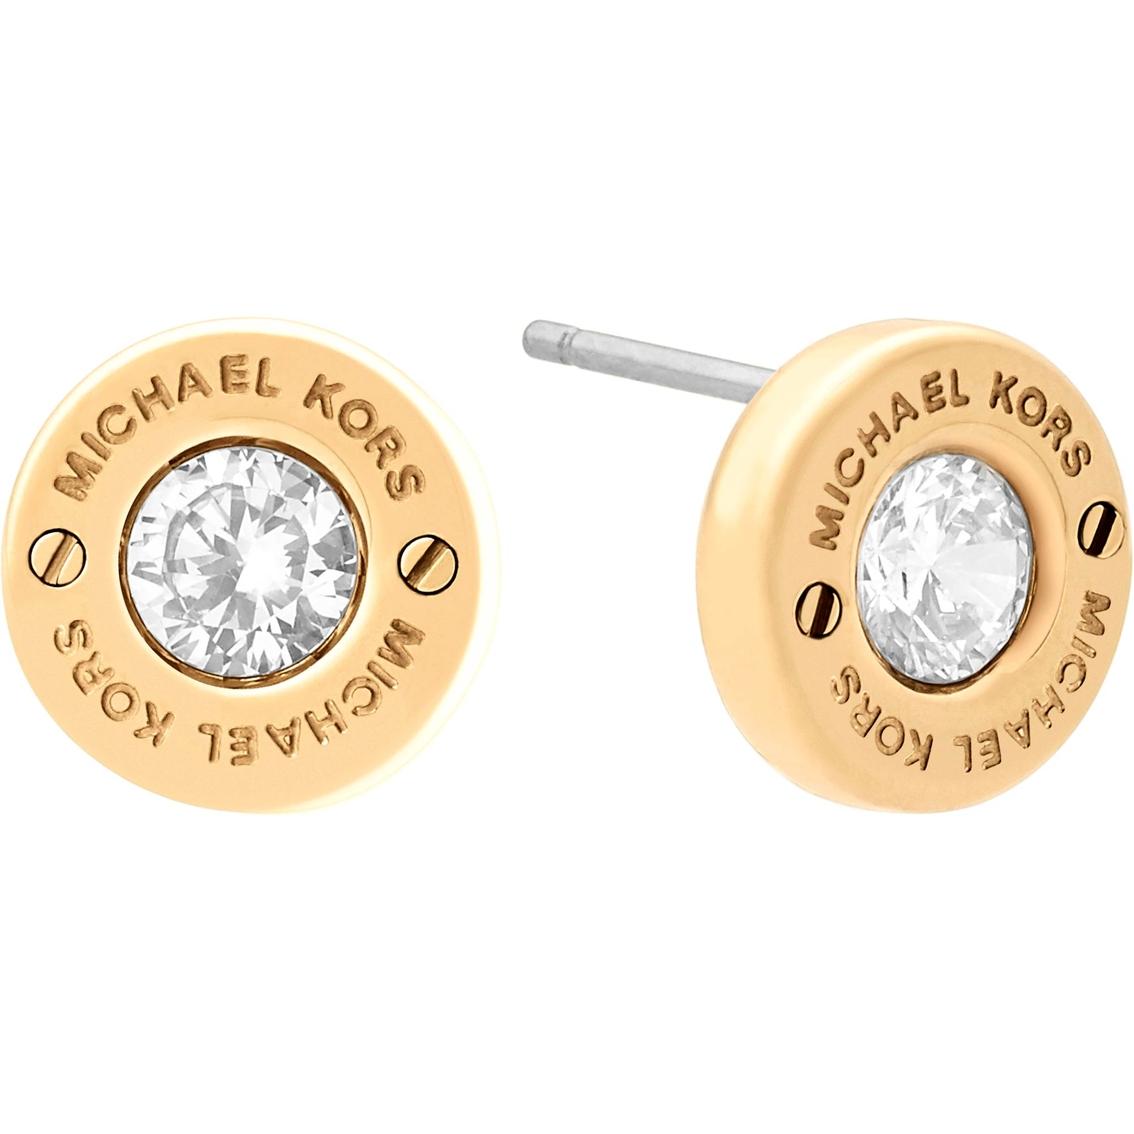 70db94863 Michael Kors Haute Hardware Precious Metal Tone And Crystal Logo. Home  Womens Jewelry Earrings Michael Kors Rose Gold Tone Logo Lock Stud. Michael  ...